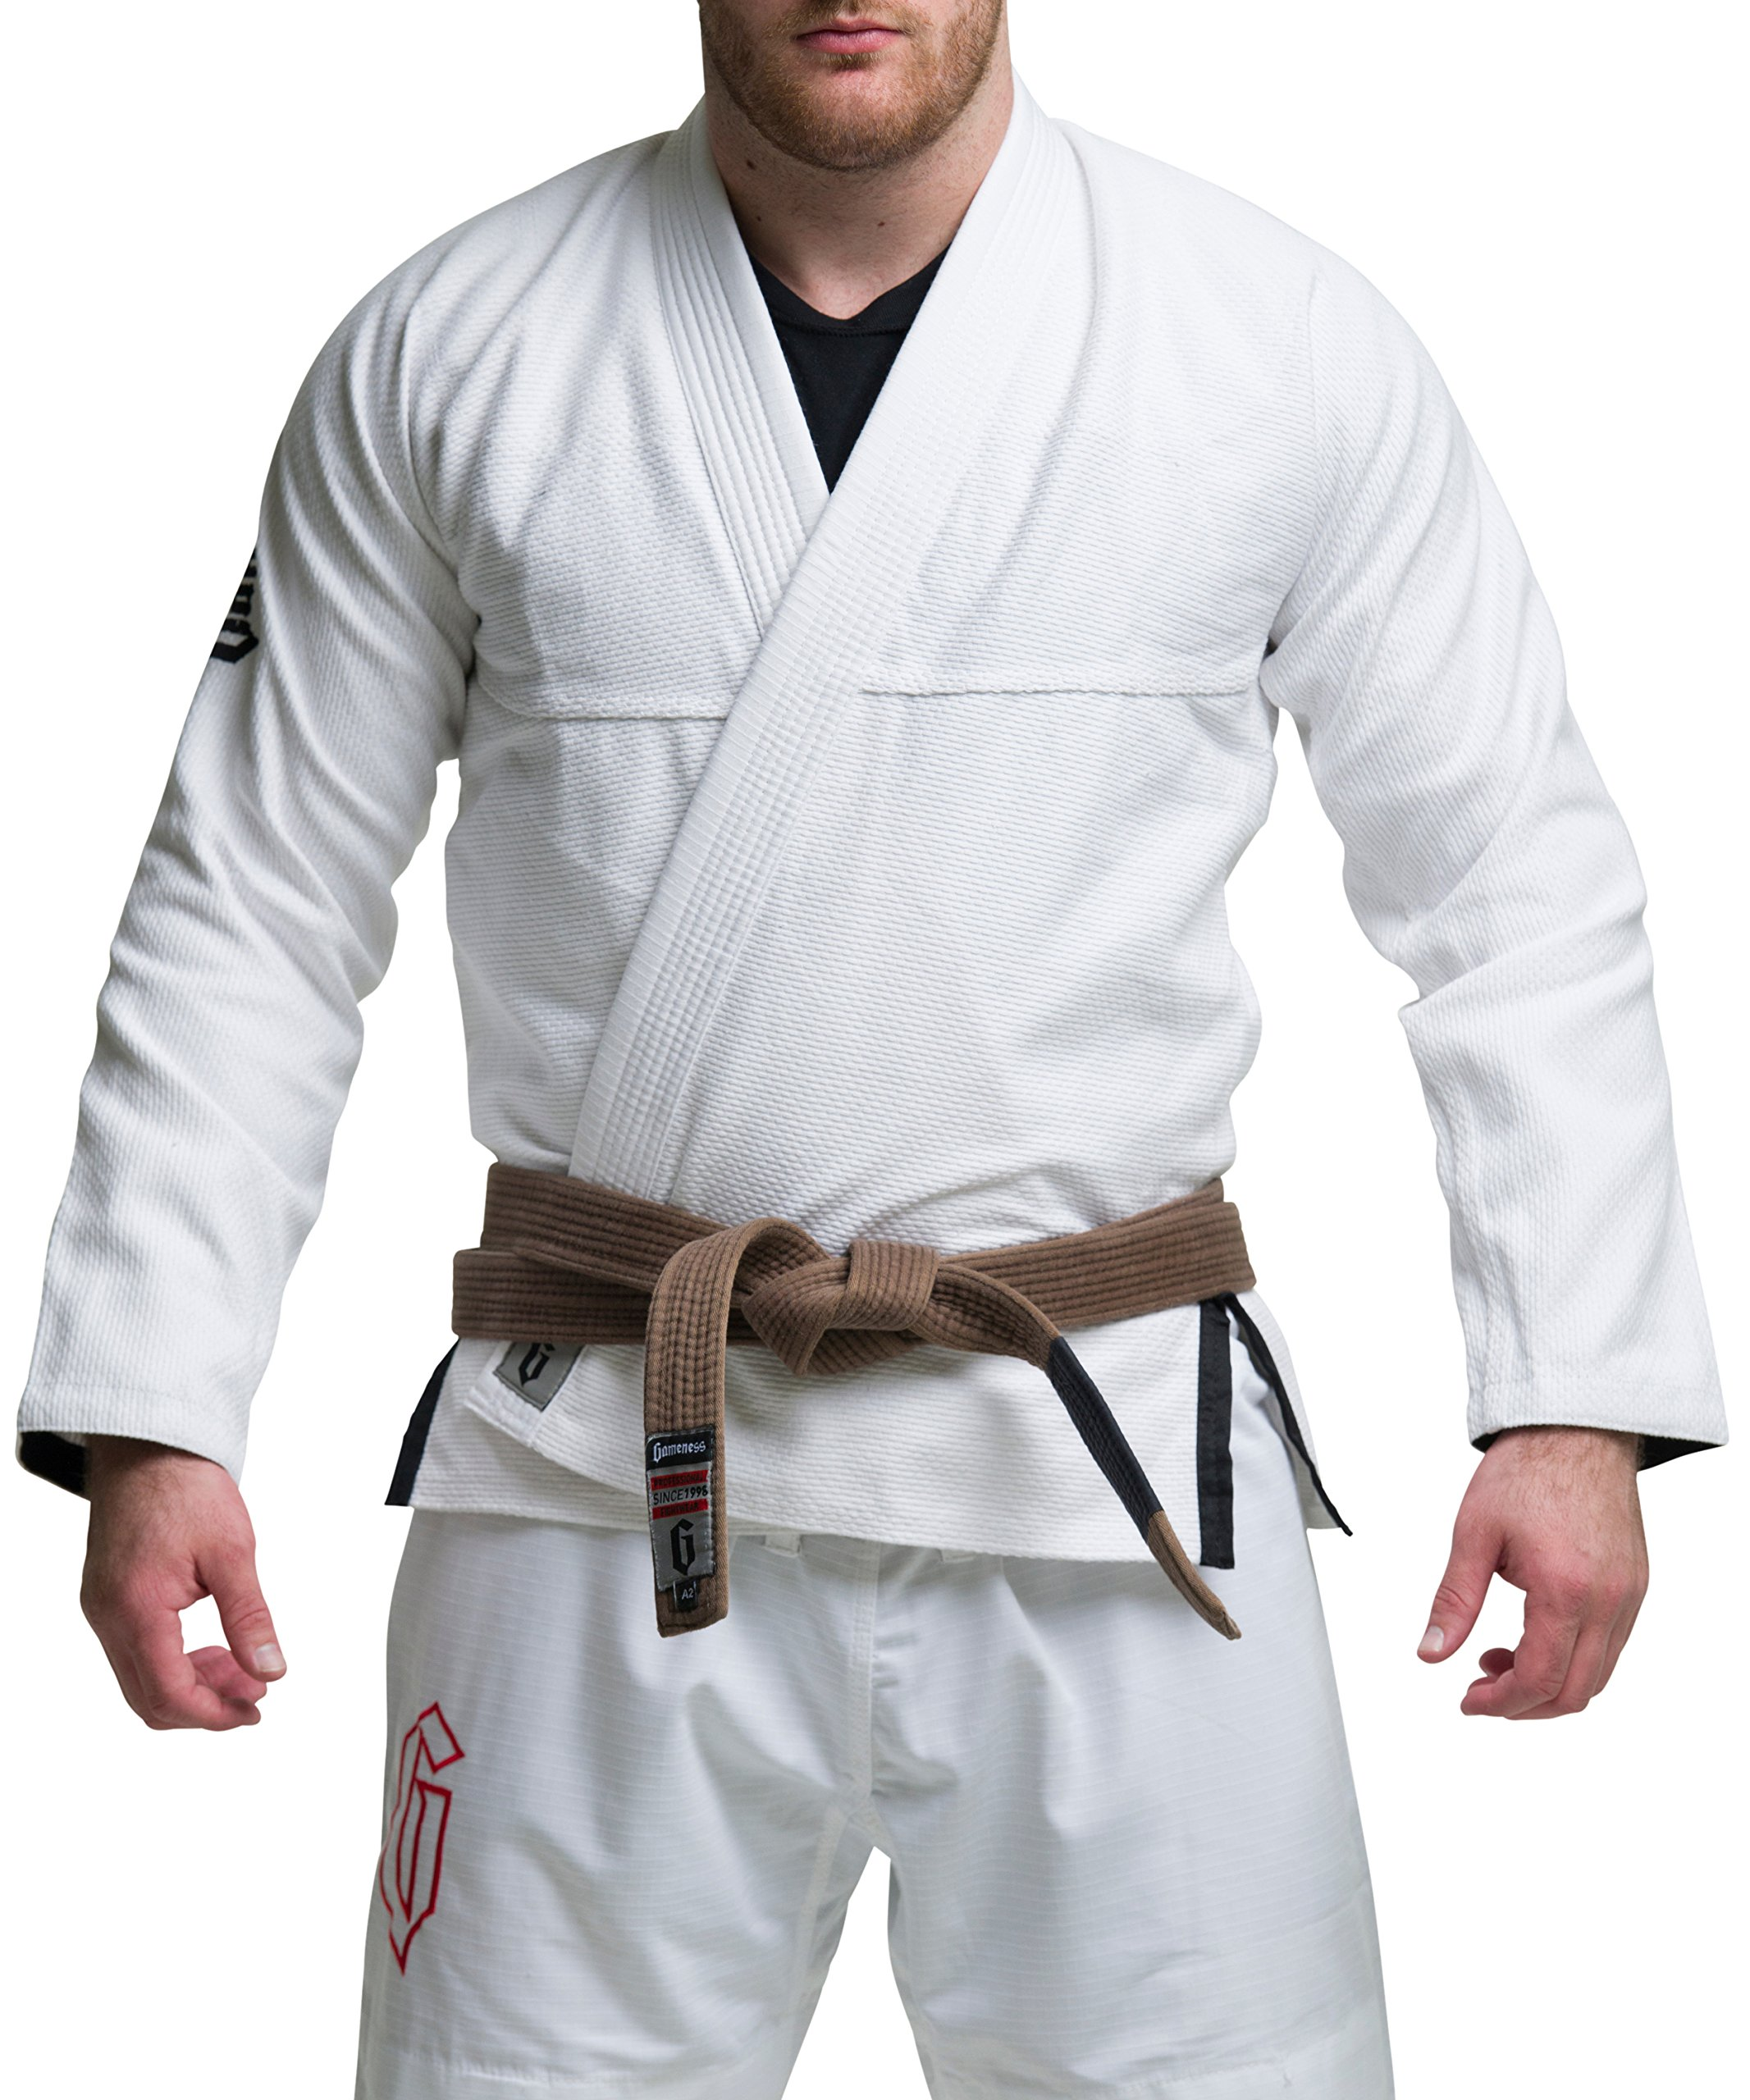 Gameness Jiu Jitsu Air Gi White A0 by Gameness